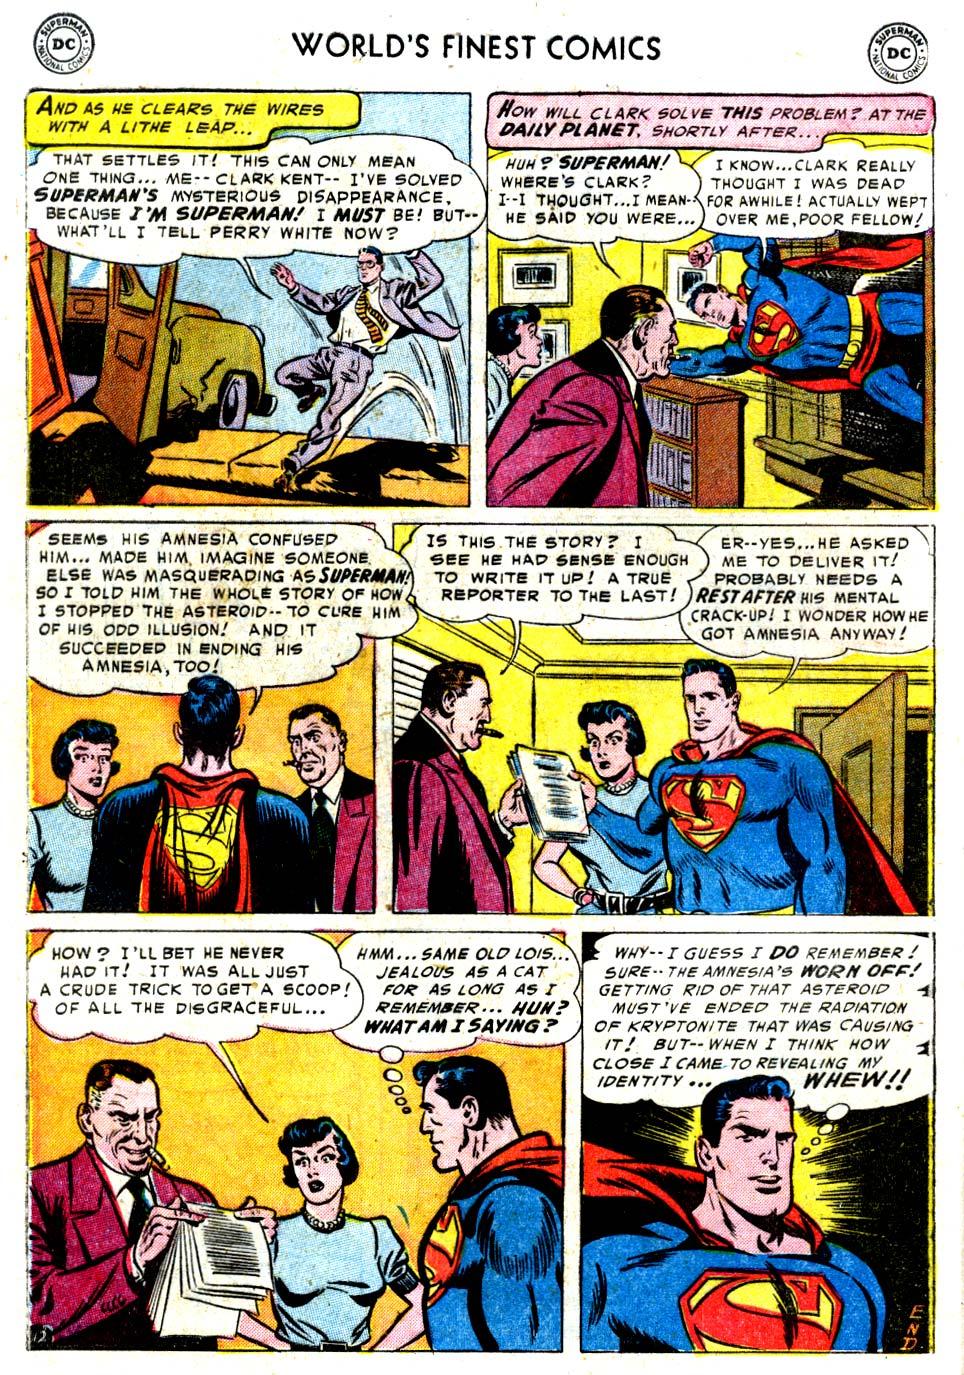 Read online World's Finest Comics comic -  Issue #68 - 14